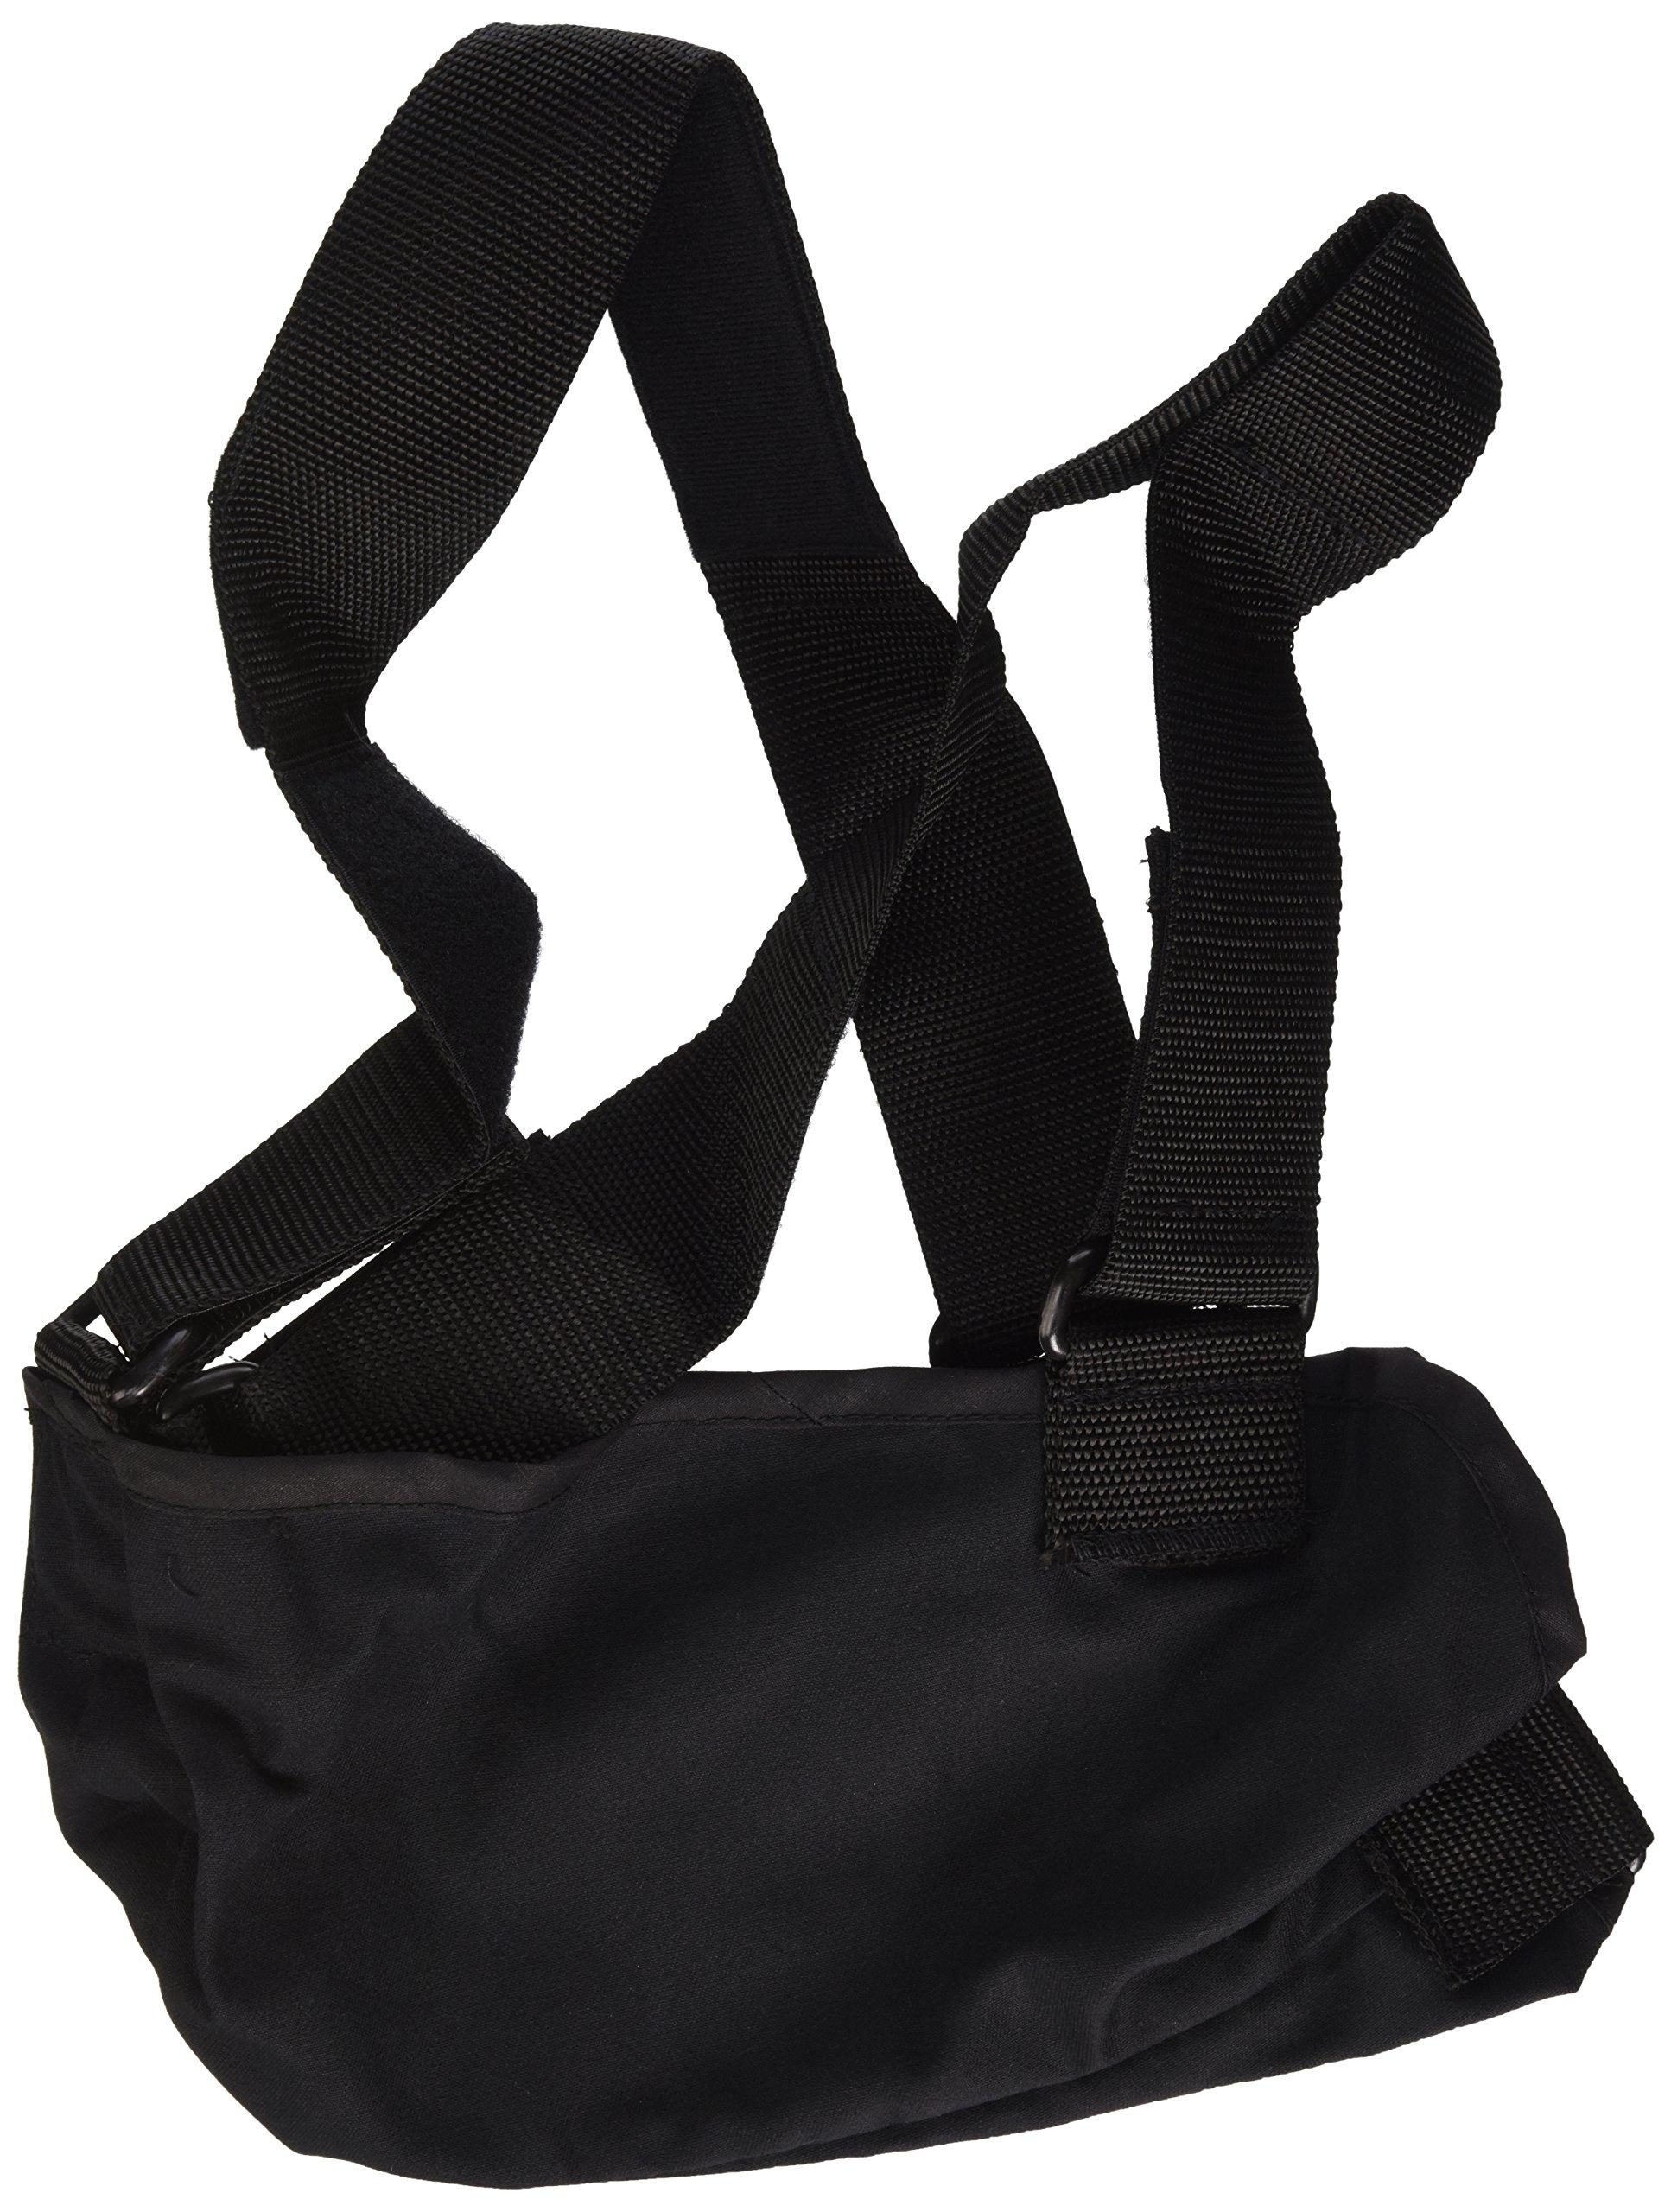 Bilt-Rite Mastex Health Arm Sling with Immobilizing Strap, Black , Small